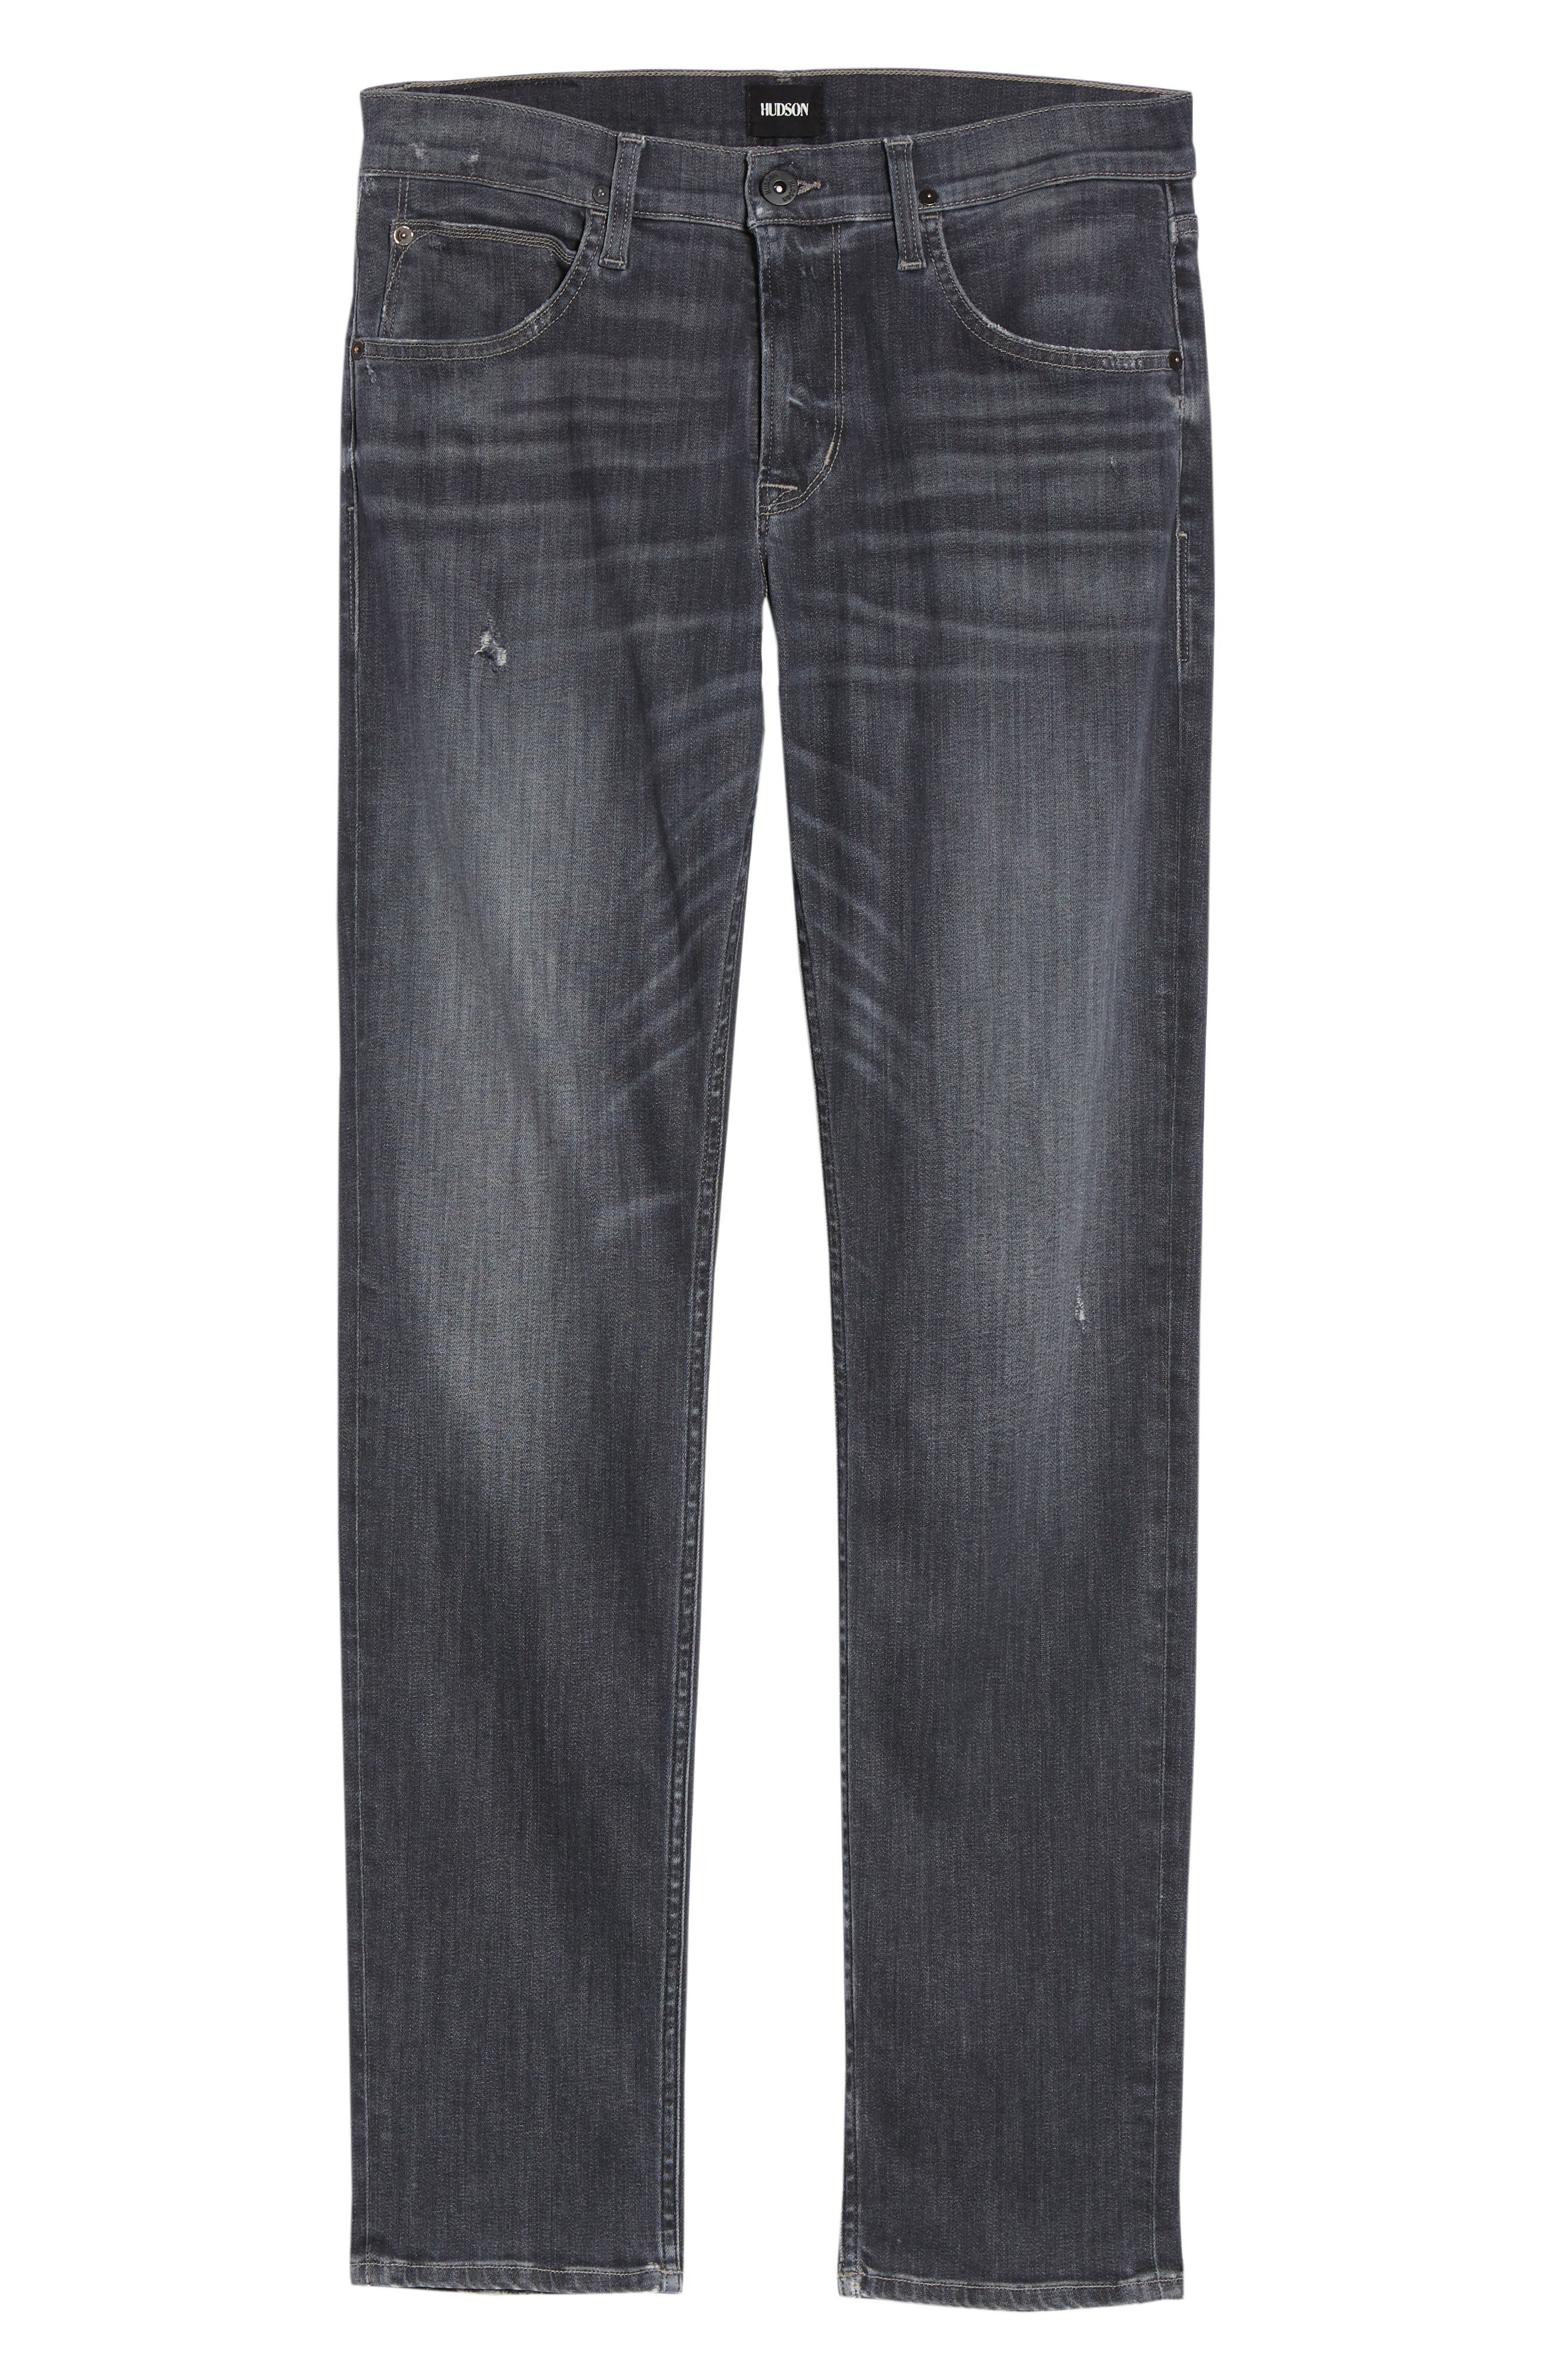 Blake Slim Fit Jeans,                             Alternate thumbnail 6, color,                             Silver Lake